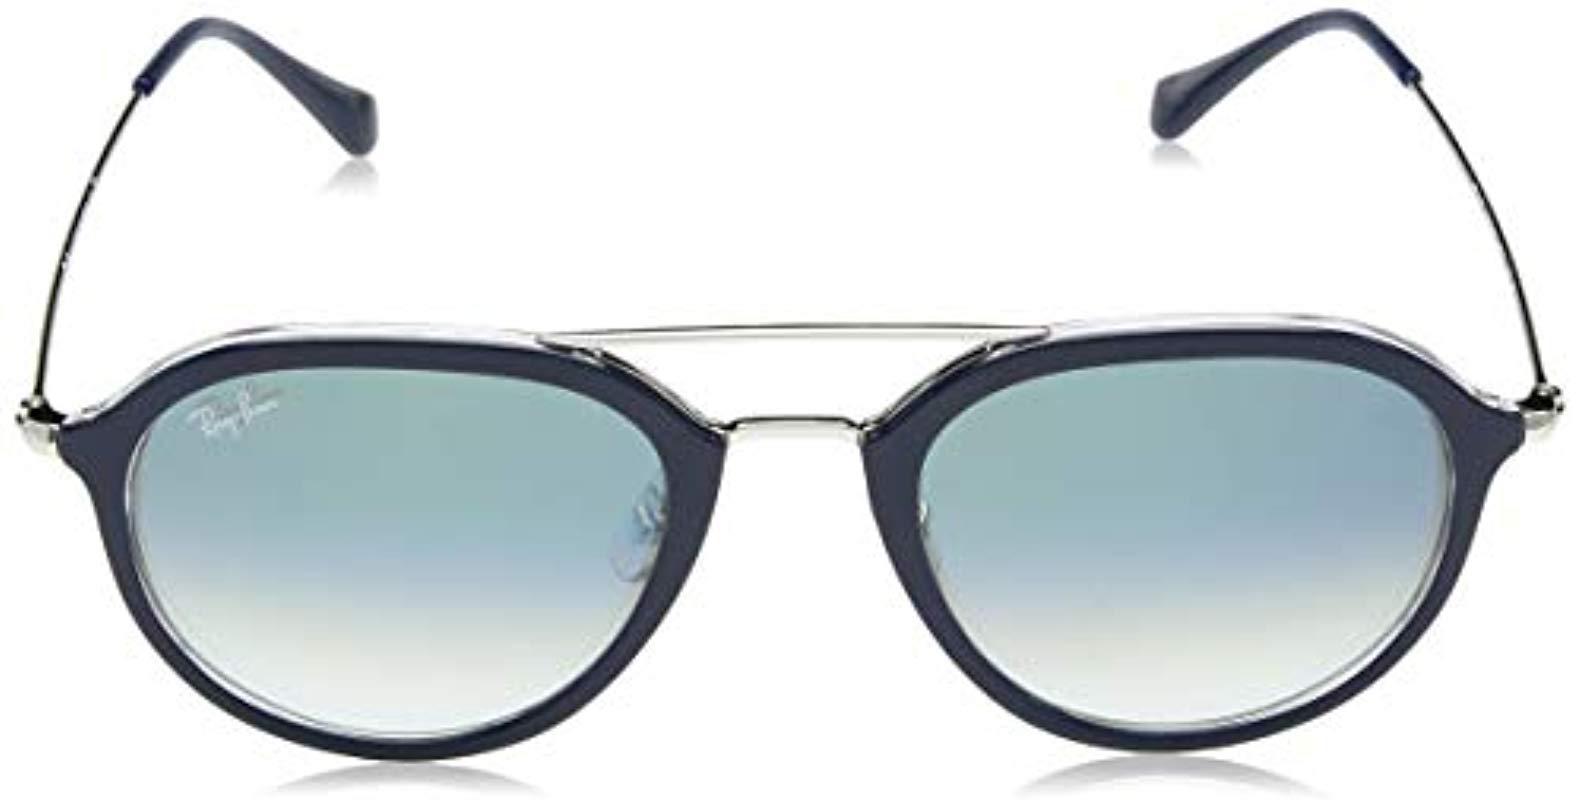 ae5f2dd3e3907 Ray-Ban Rayban Unisex s 0rb4253 60533a 50 Sunglasses